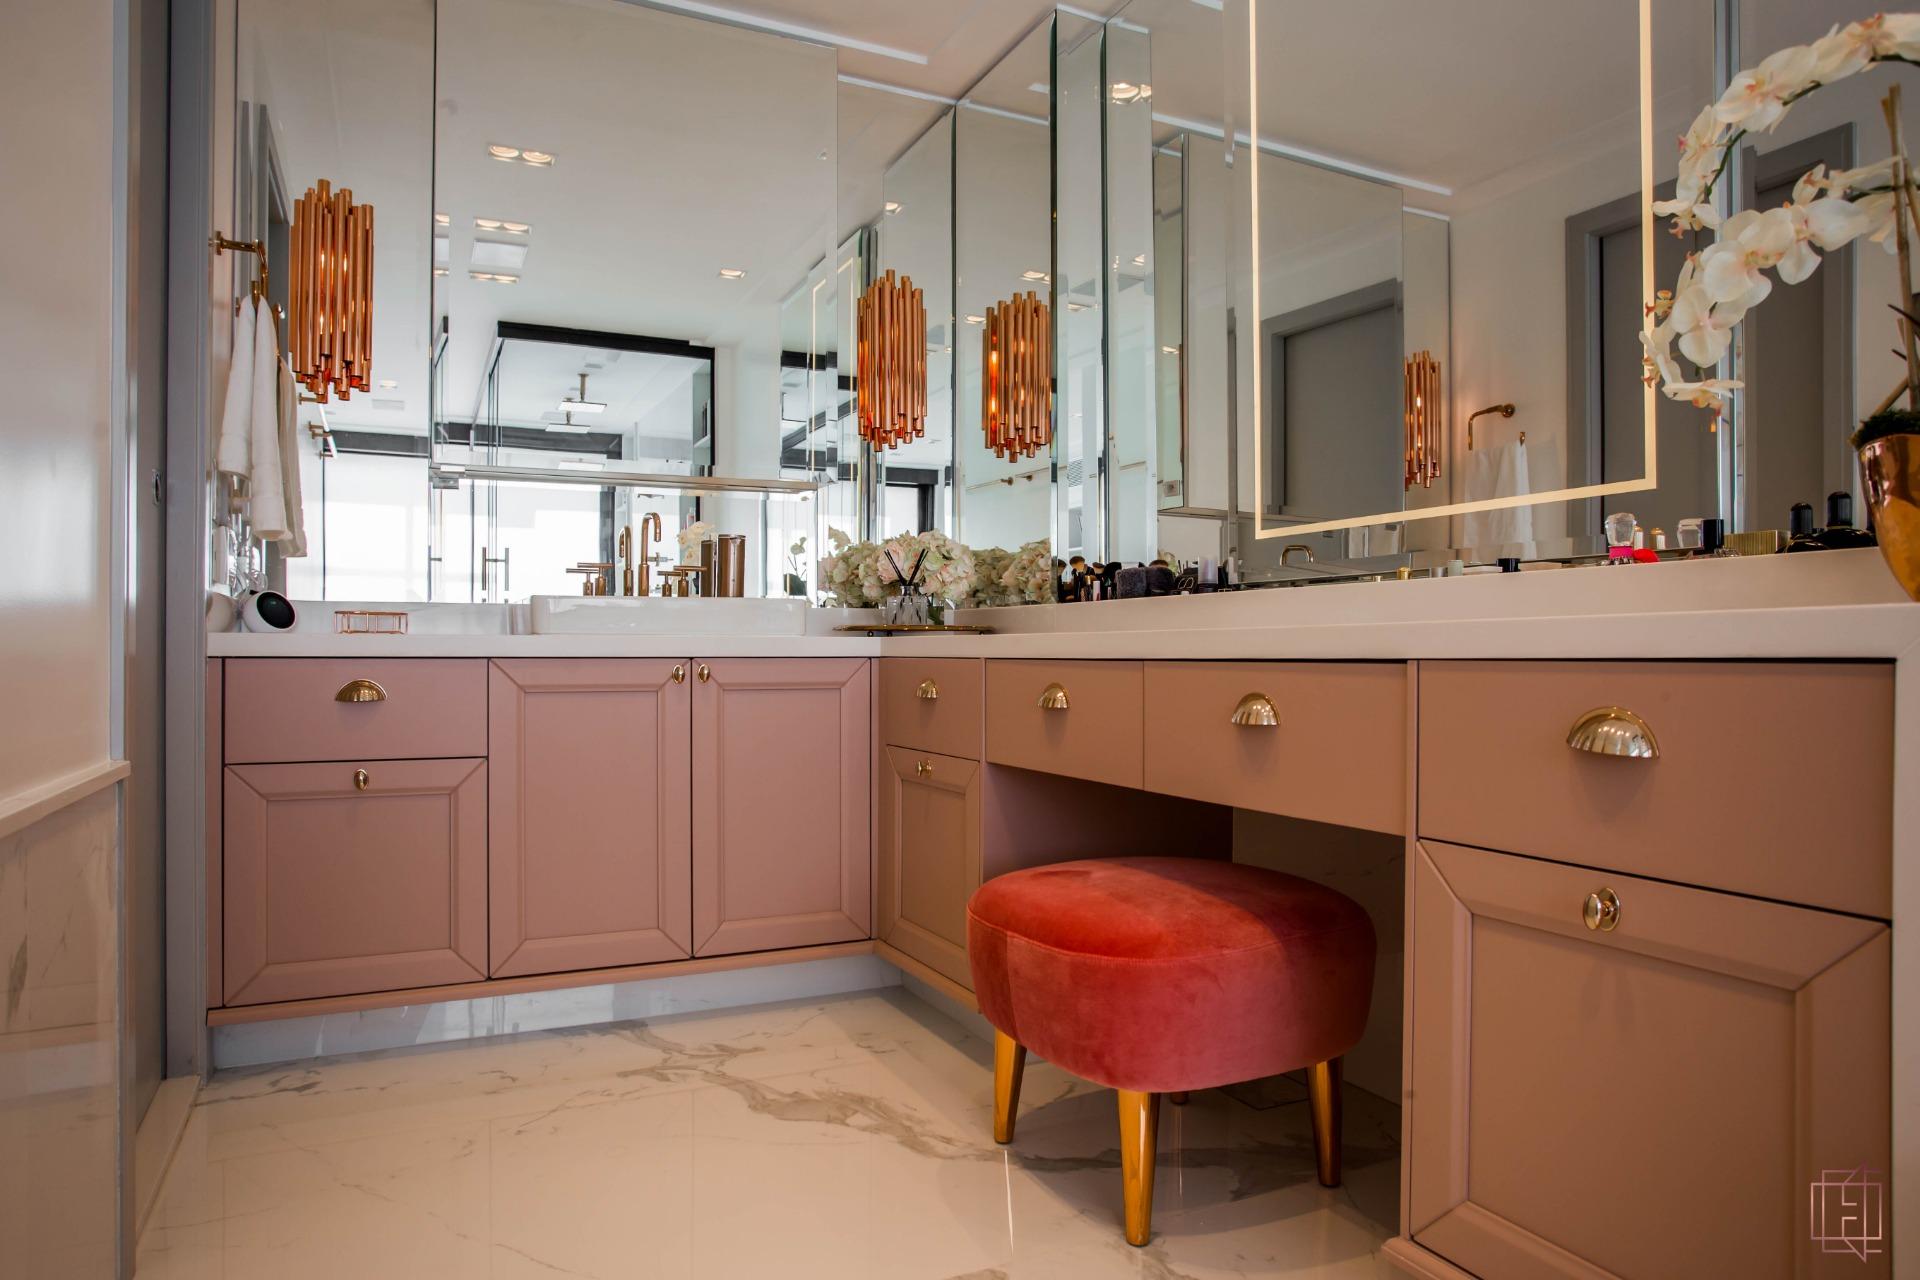 electrix design European Classic Meets Art Décor: CHECK OUT ⬇️ This Luxurious Penthouse in Brazil By Electrix Design! 1 17